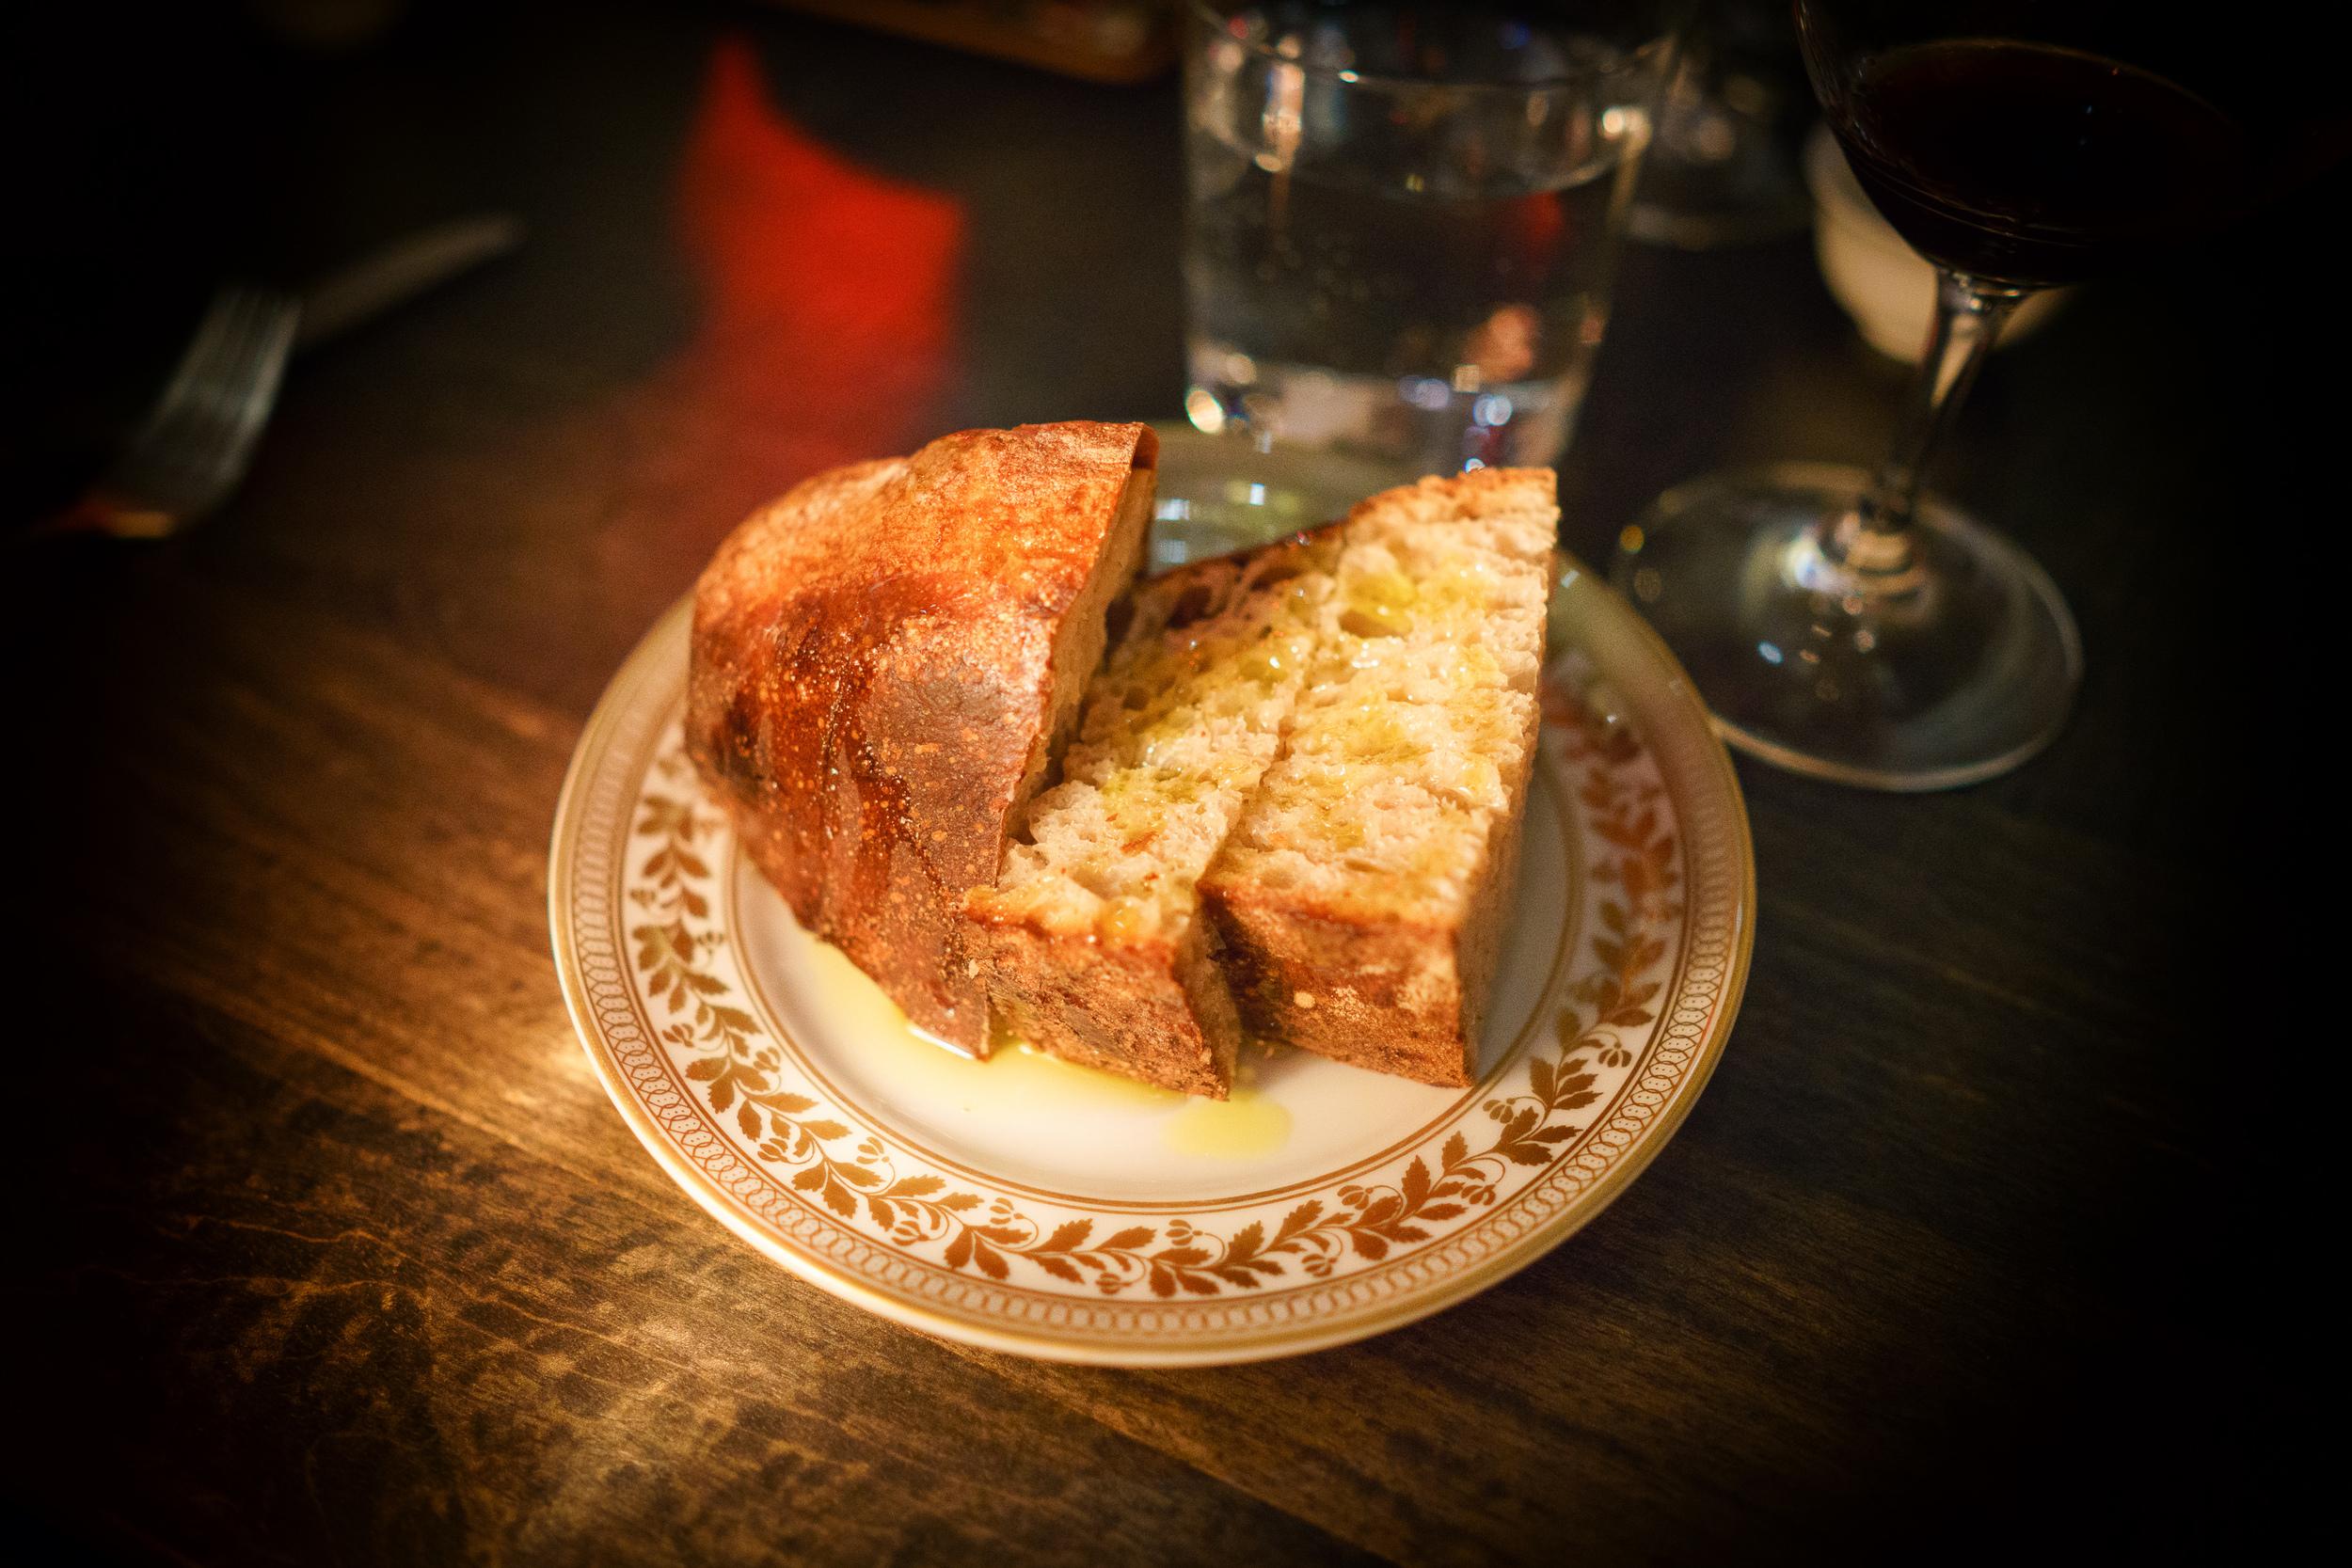 House-baked sourdough